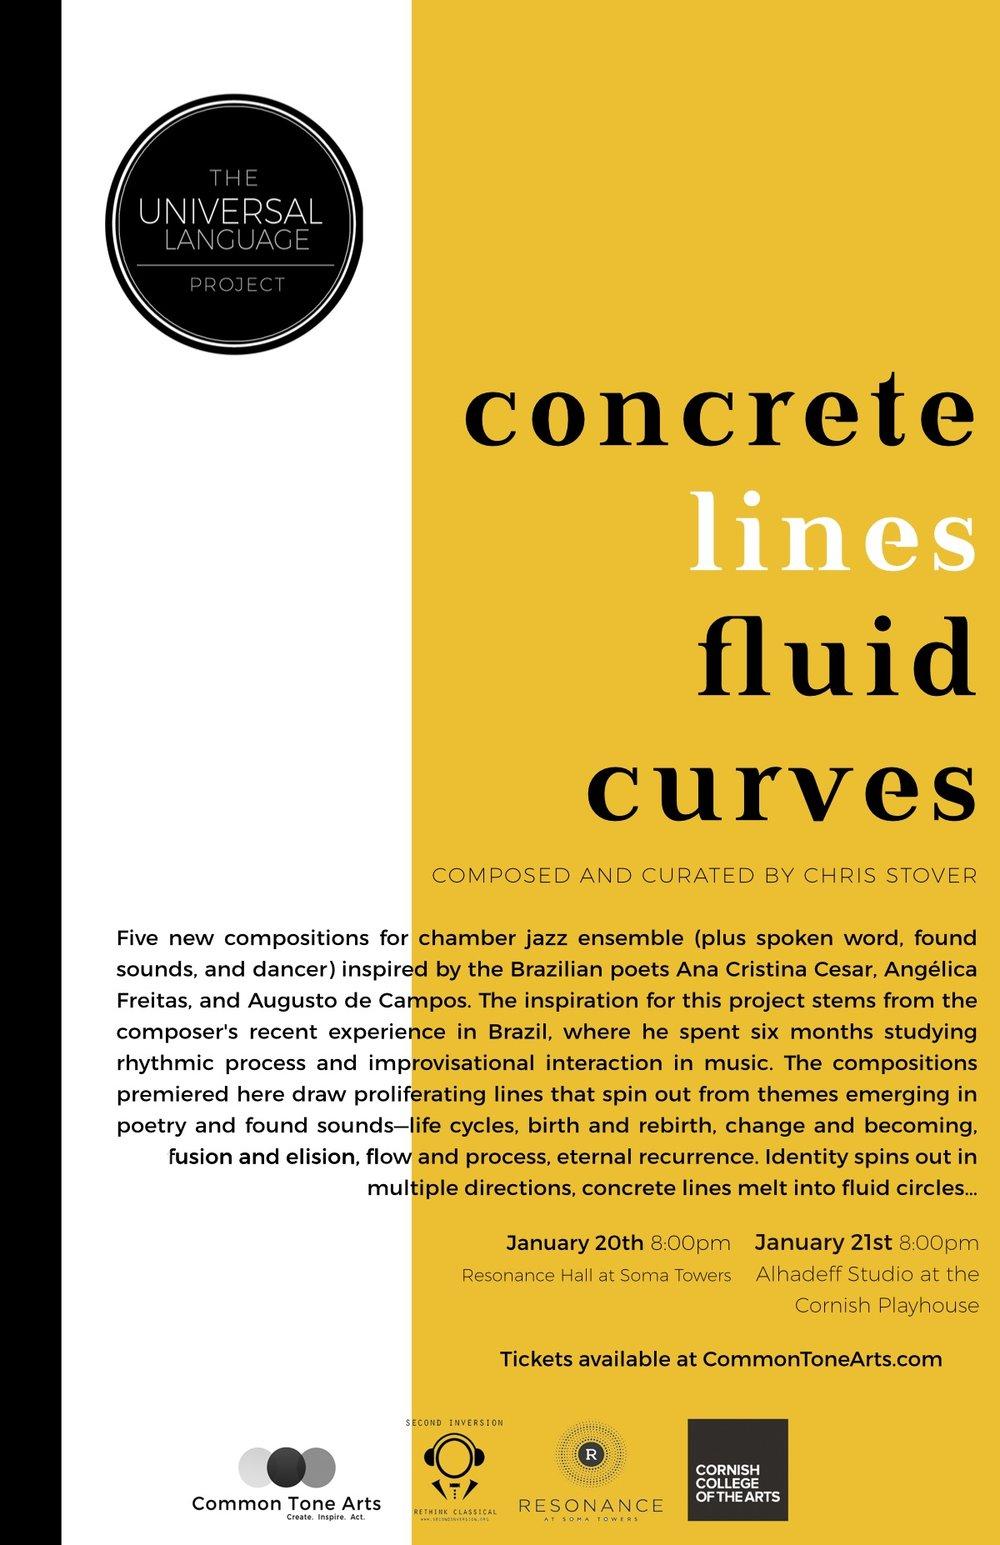 concretelinesfluidcurves.jpg